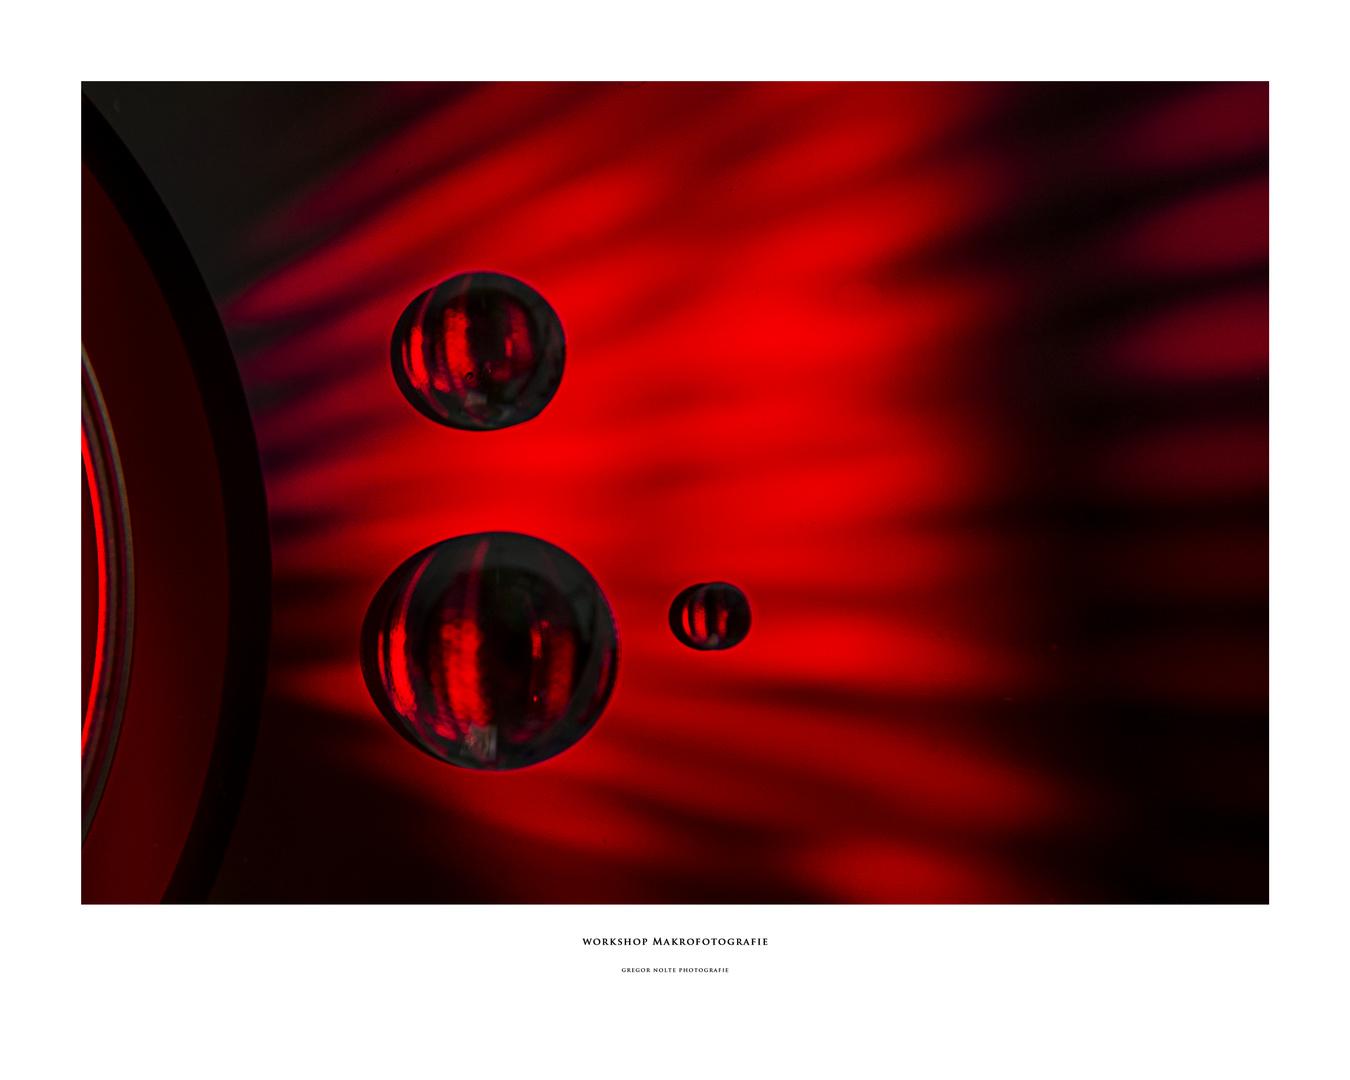 Workshop Makrofotografie Aufbau CD 1